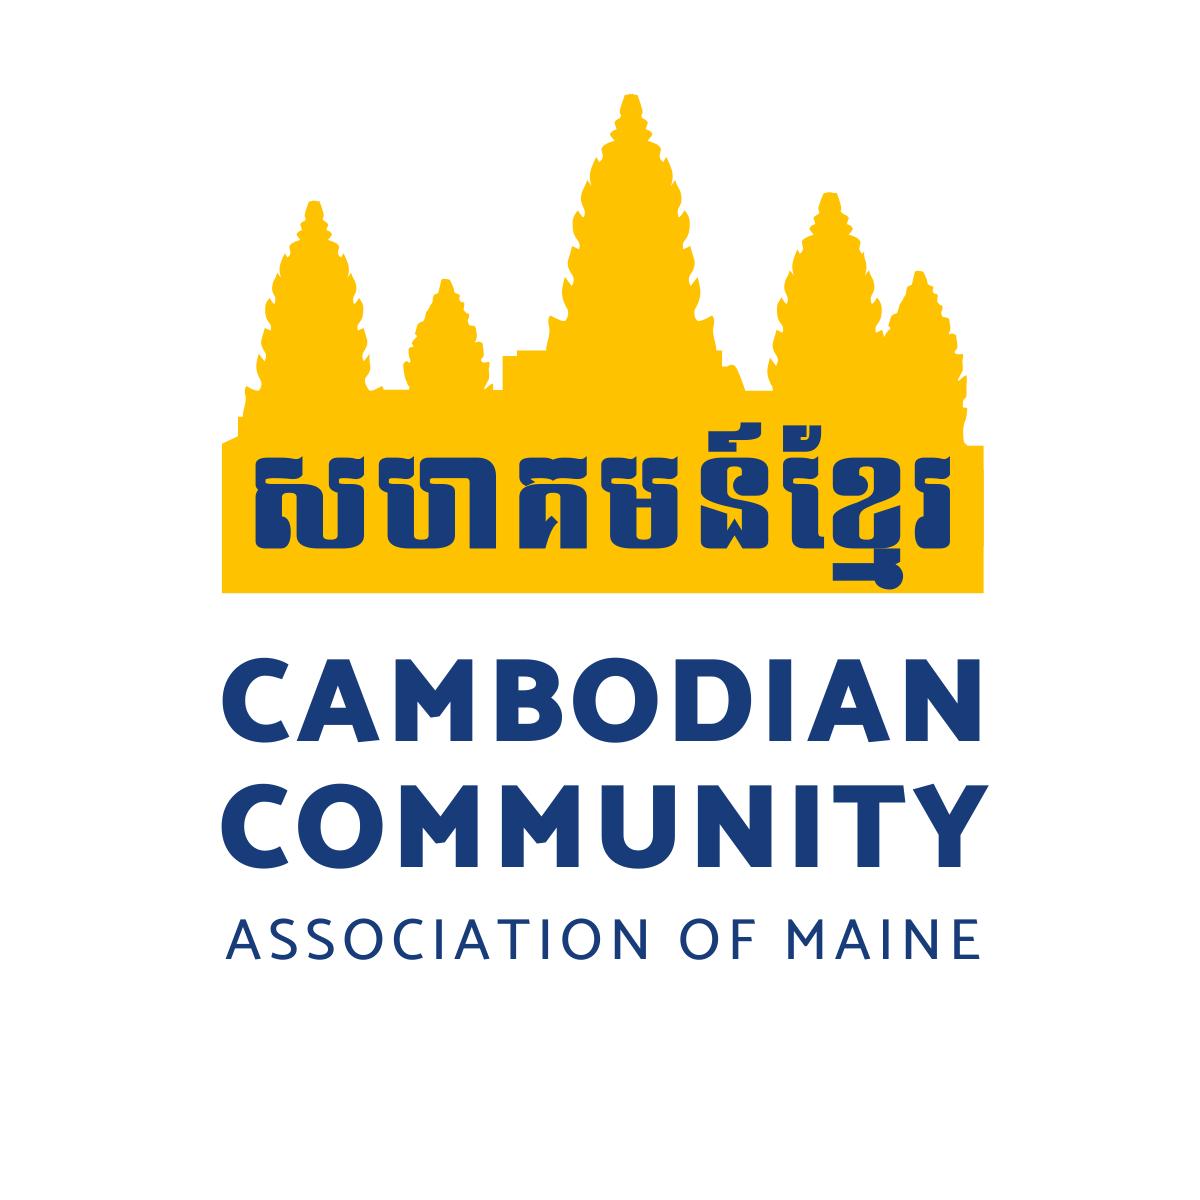 cambodian community